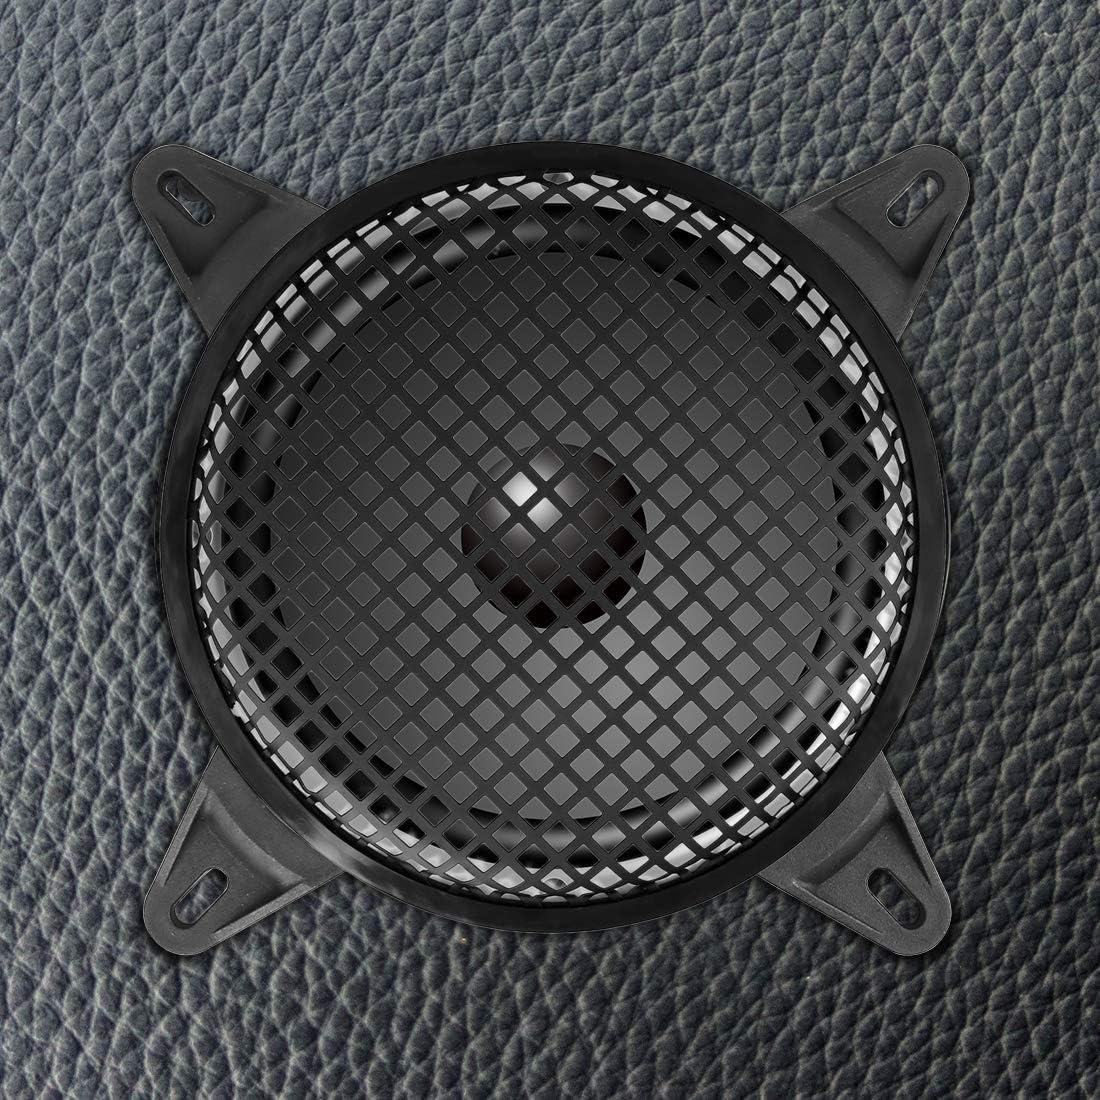 X AUTOHAUX 10 Inch Black Car Audio Speaker Cover Metal Mesh Subwoofer Grill Horn Guard